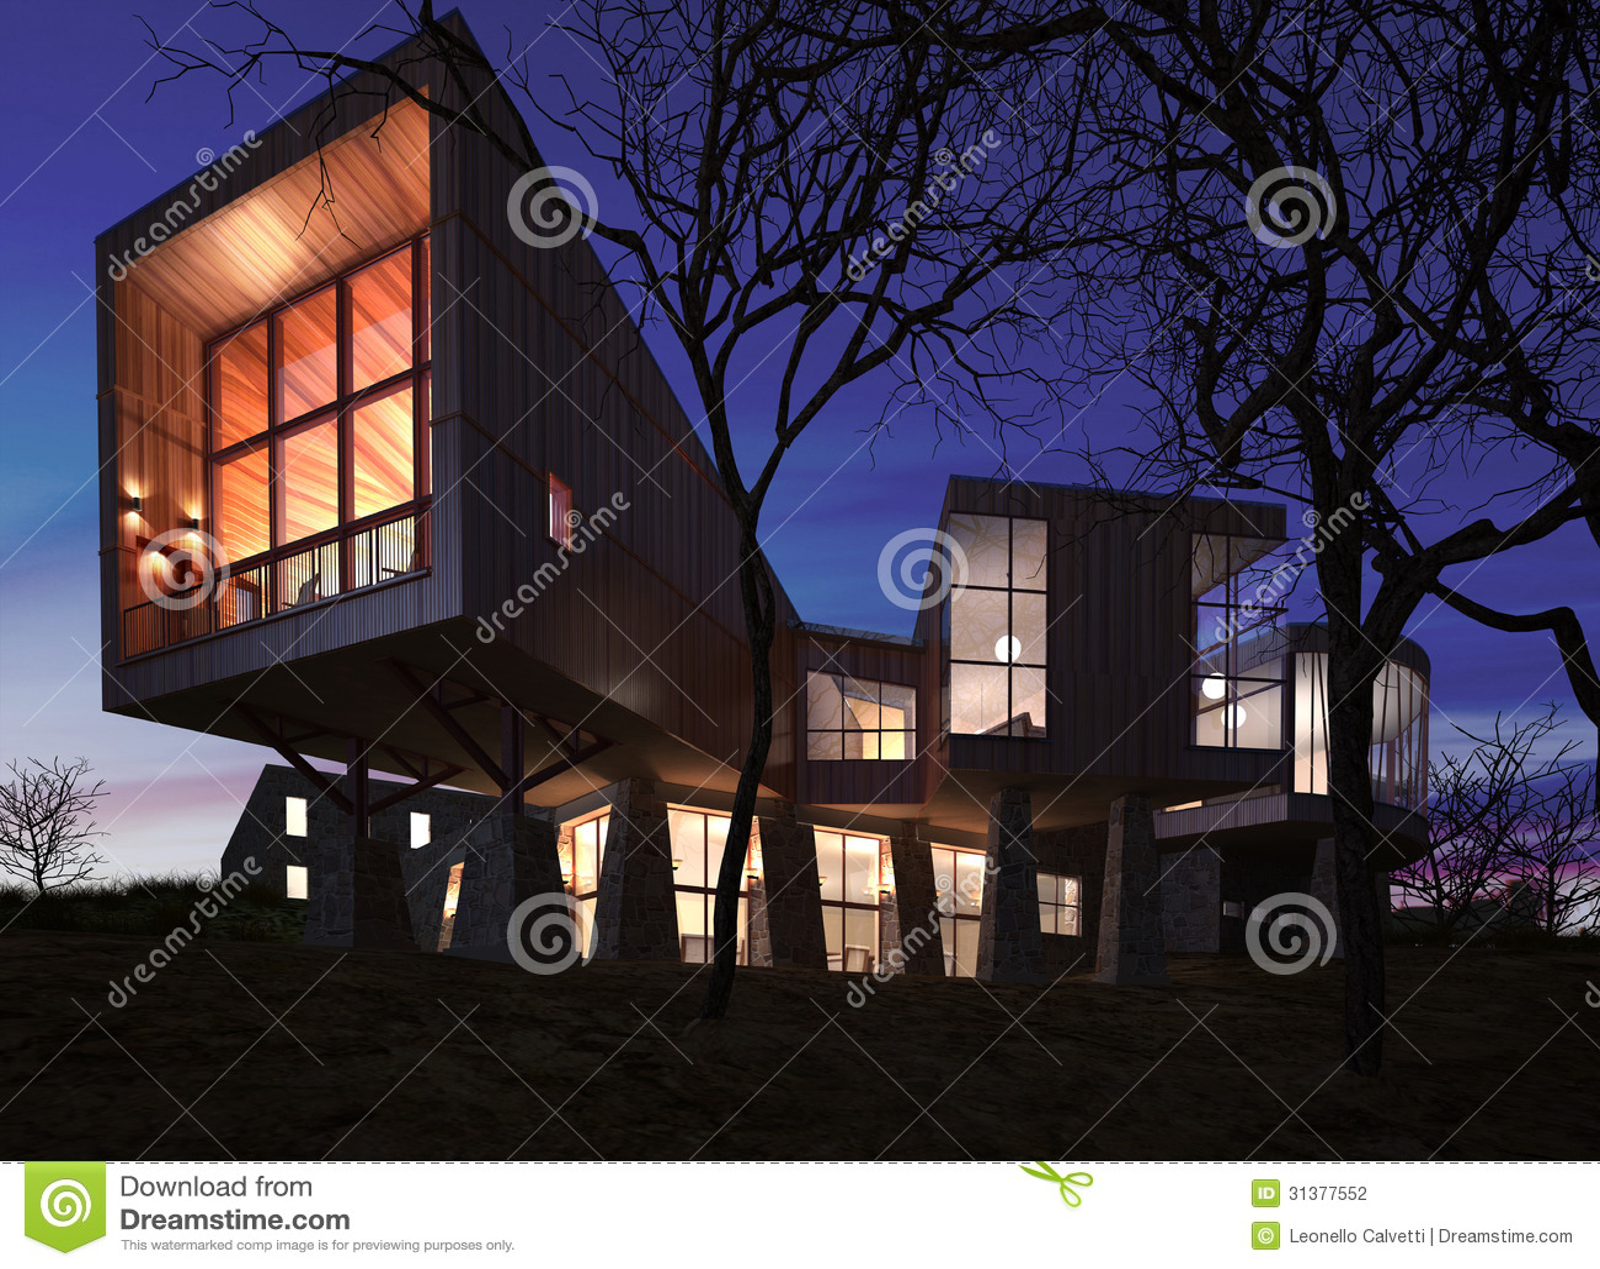 Zeer modern modieus die huis van hout steen en glas wordt gemaakt stock illustratie - Zeer moderne woning ...